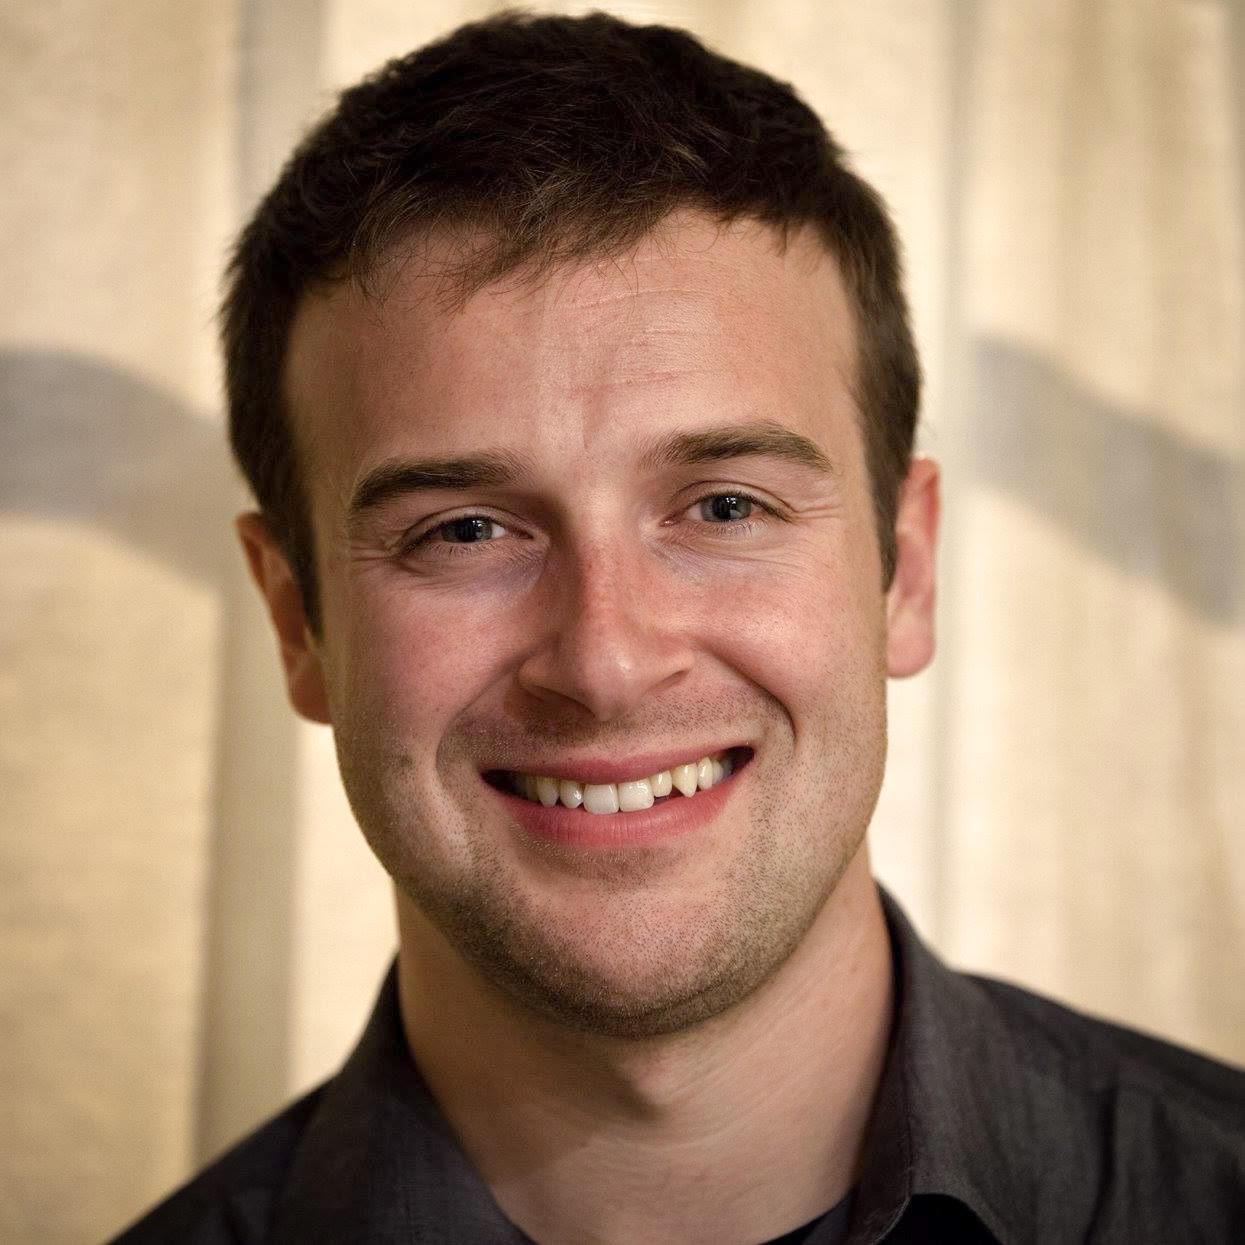 Joshua Halbert